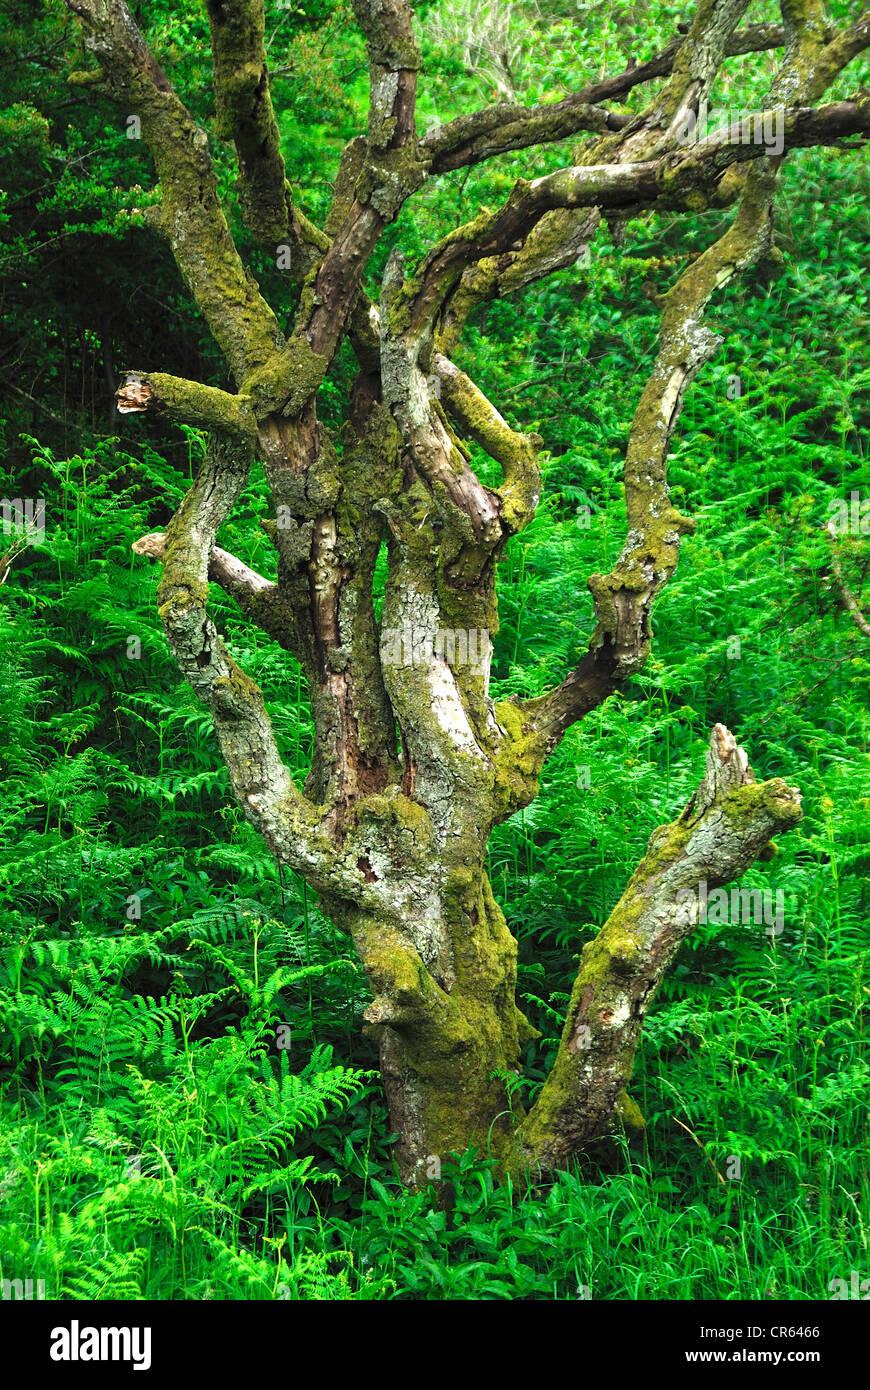 A dead tree with bracken UK Stock Photo